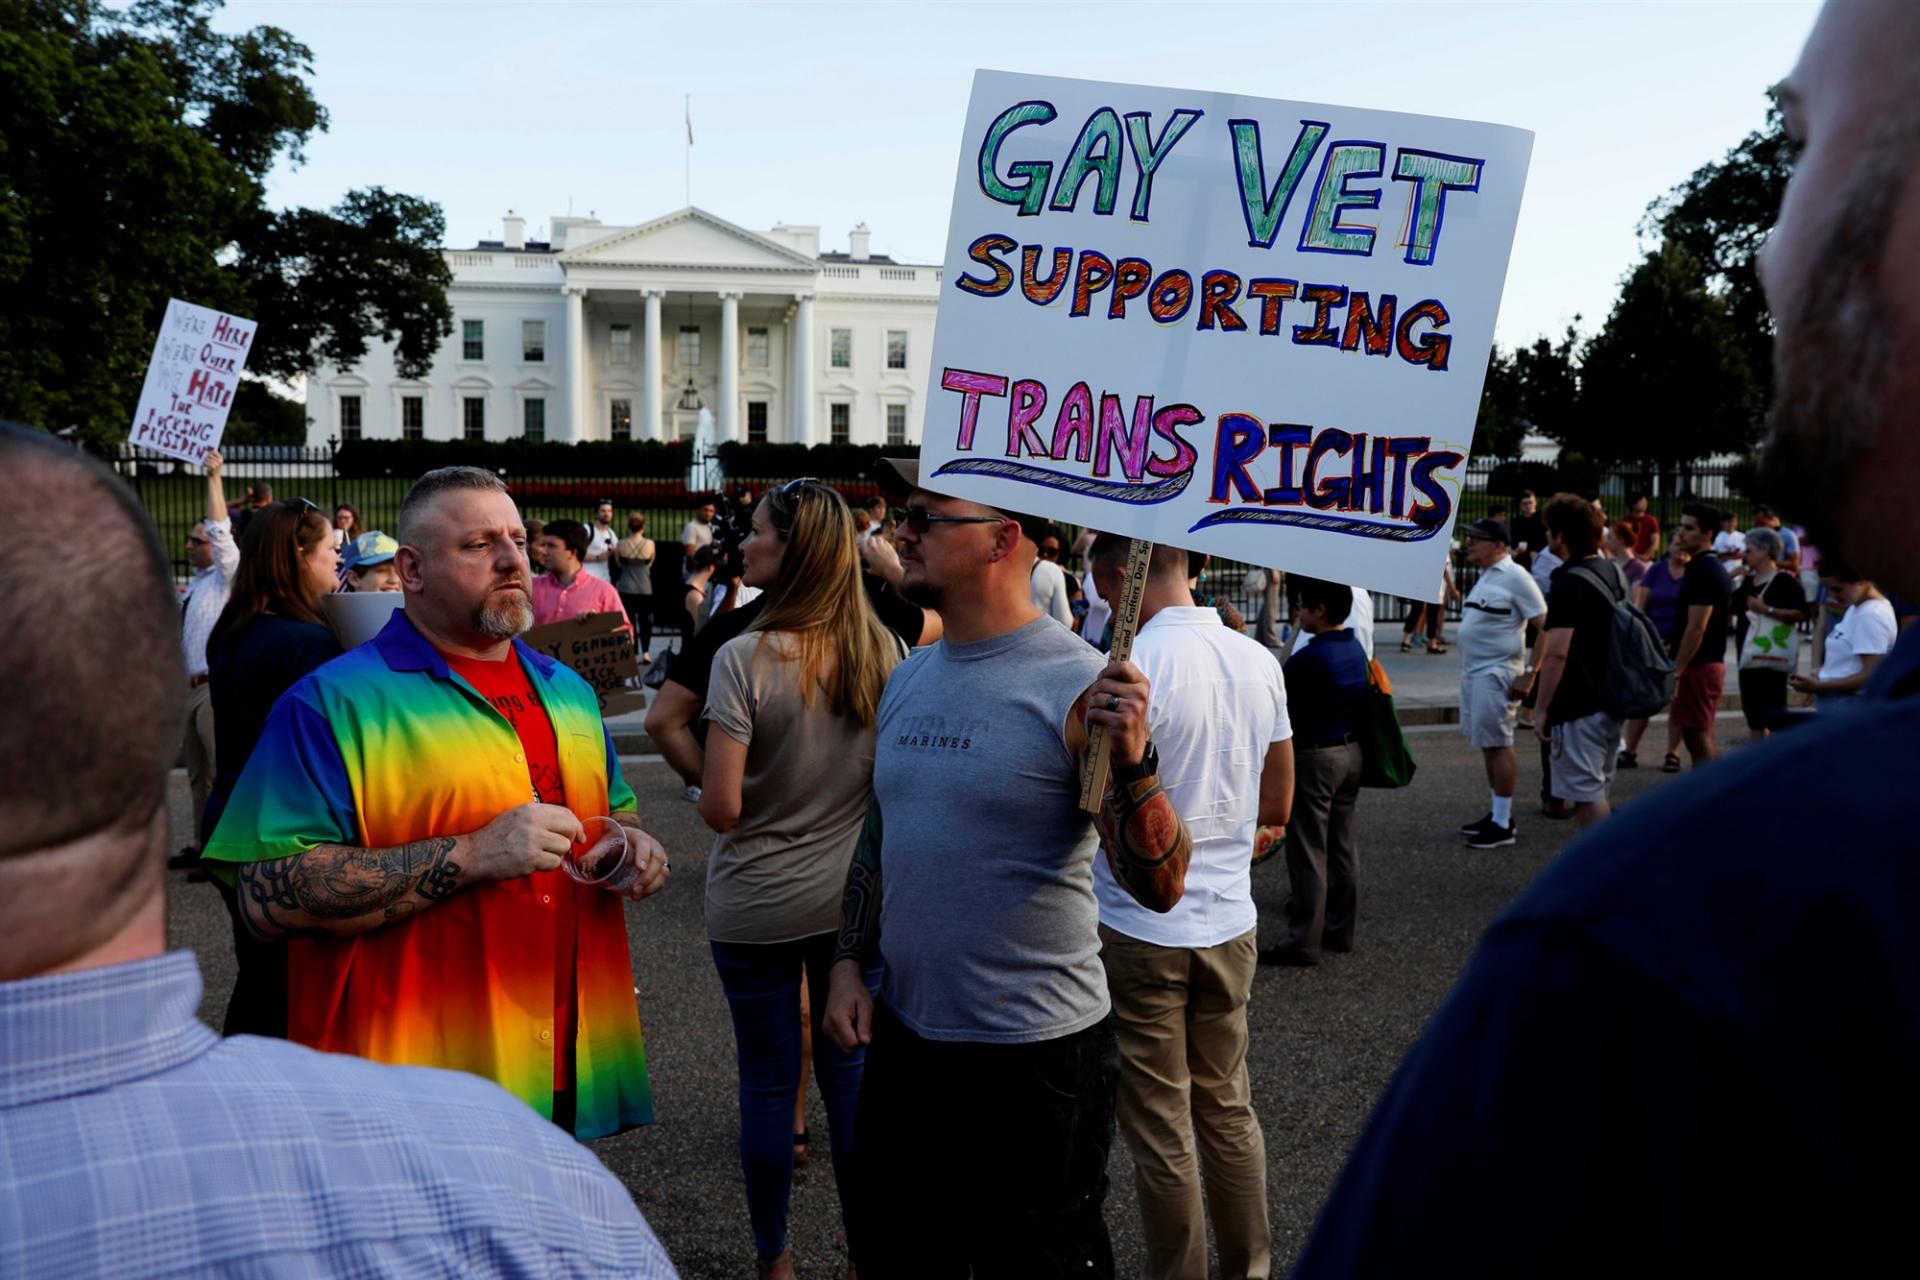 president joe biden reverses trumps transgender military ban given rights to lgbt community